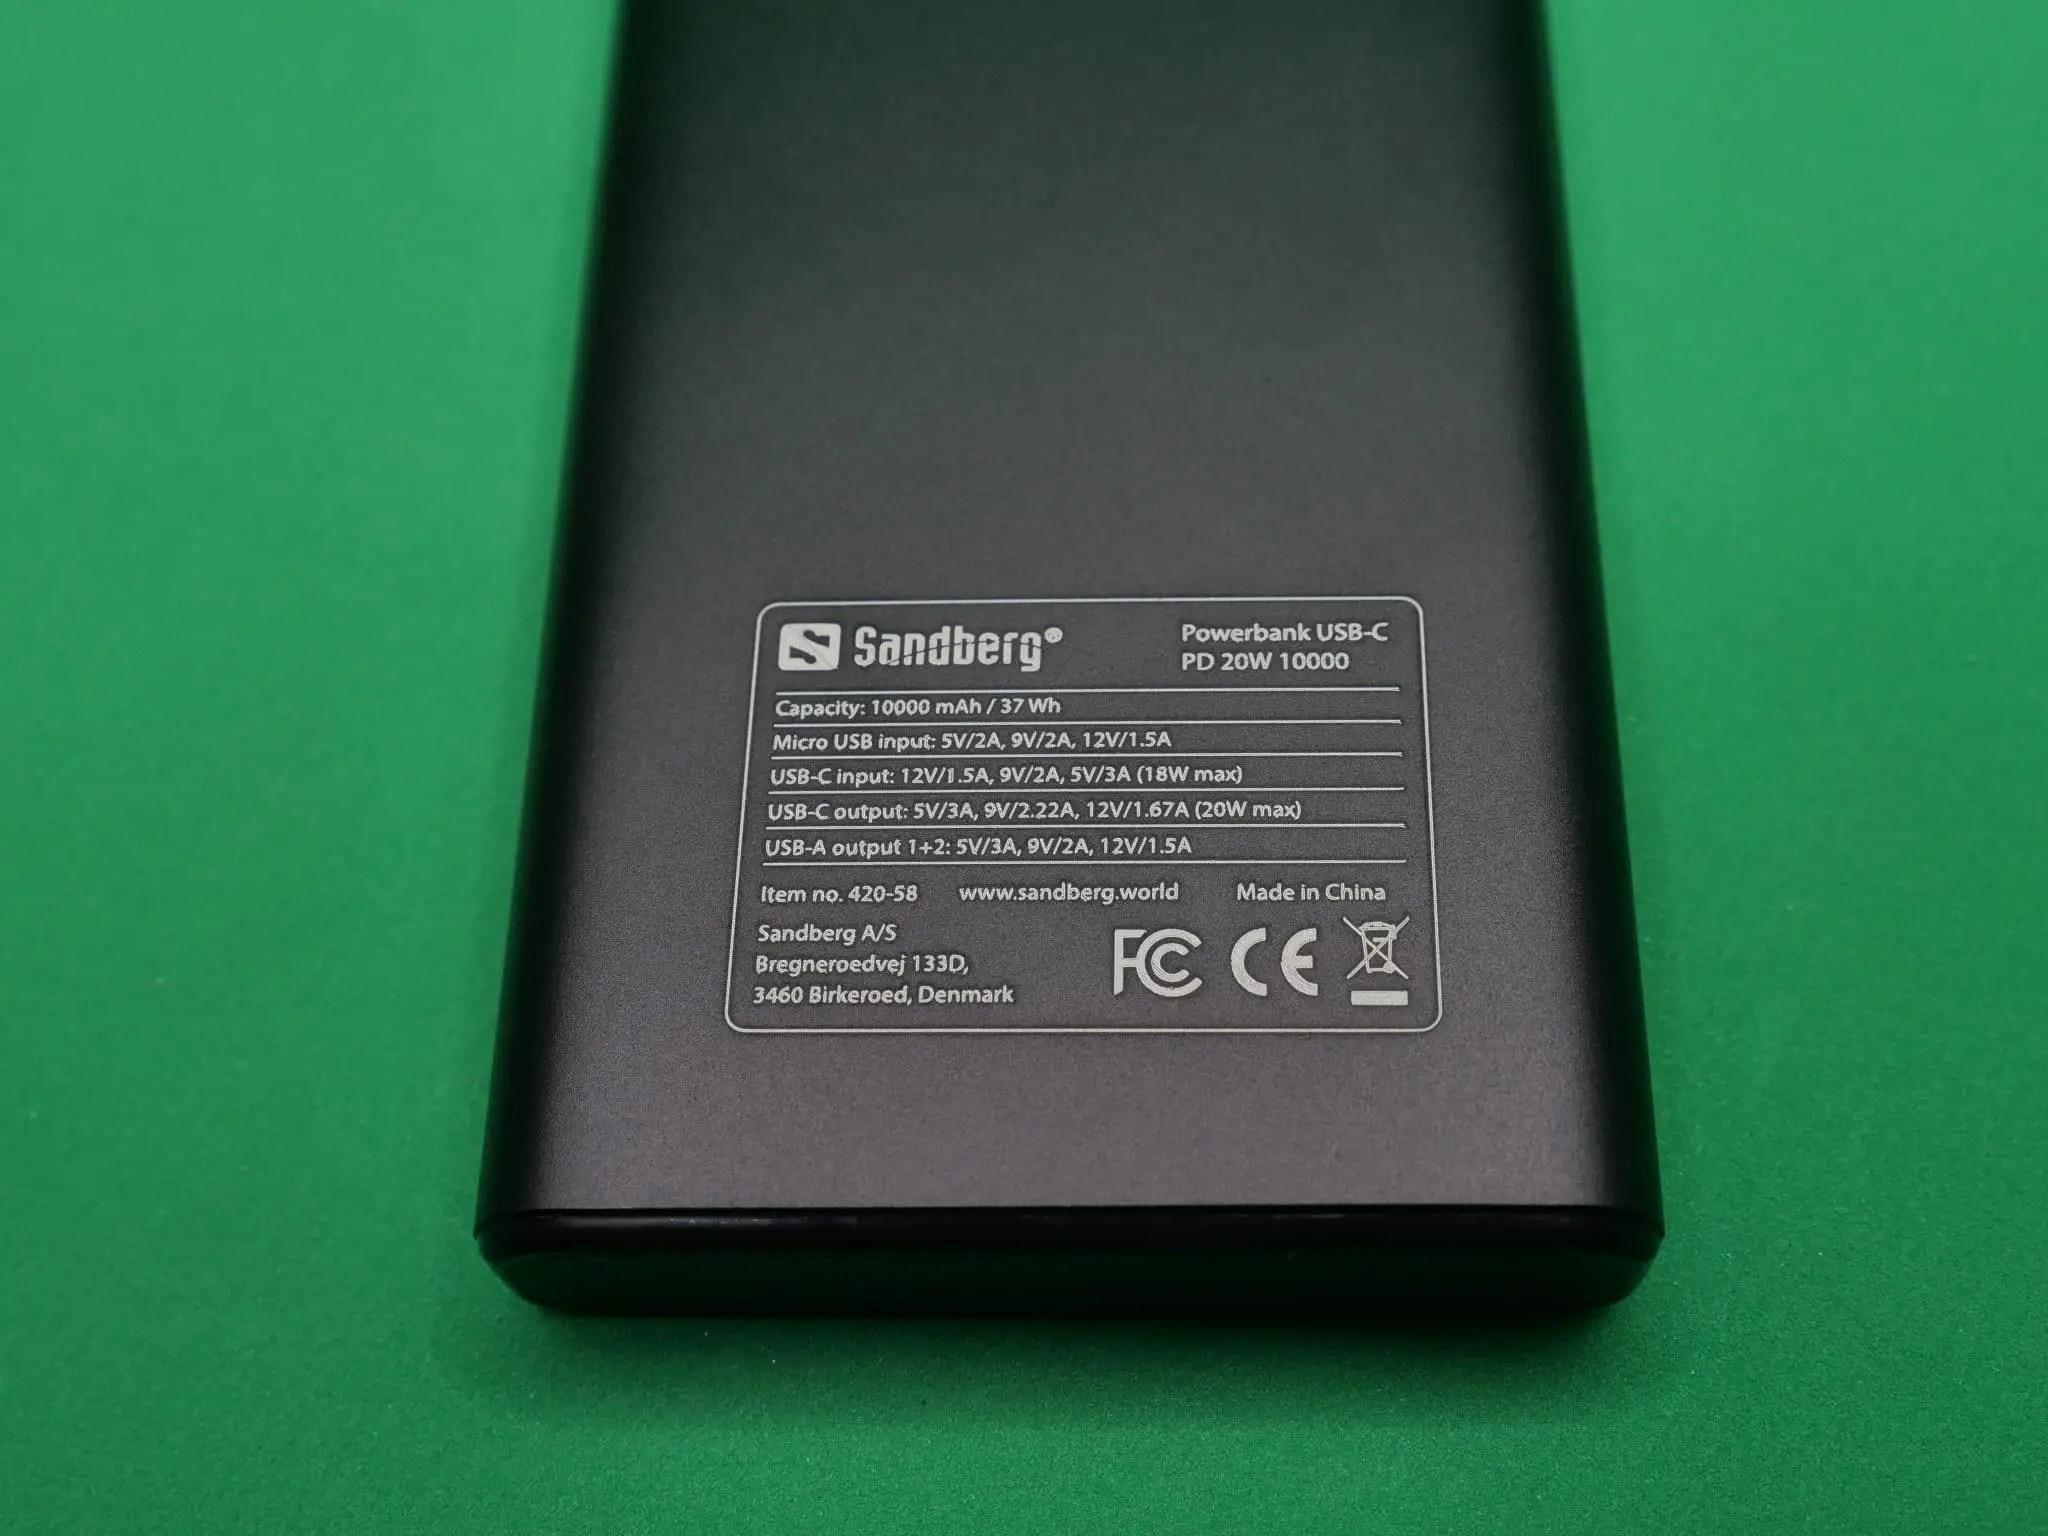 Powerbank Sandberg USB-C PD 20W 10000 charging mode